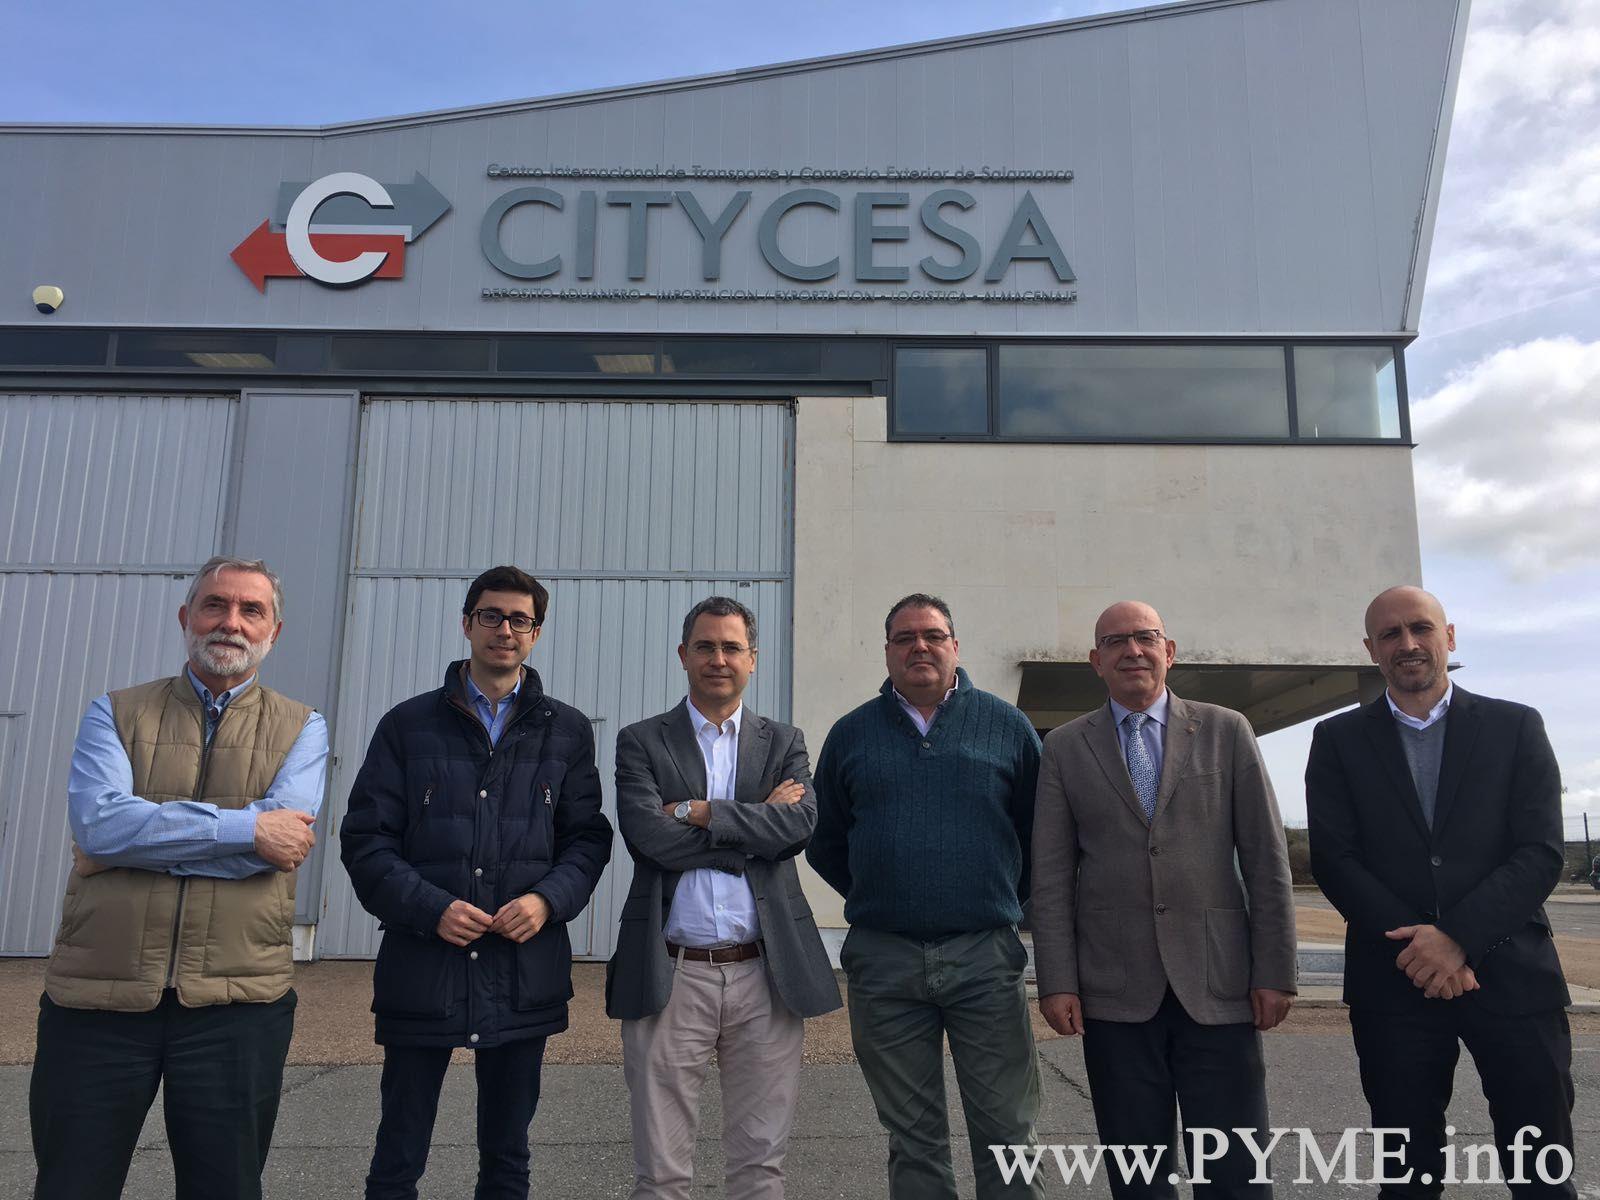 PSOE_Citycesa